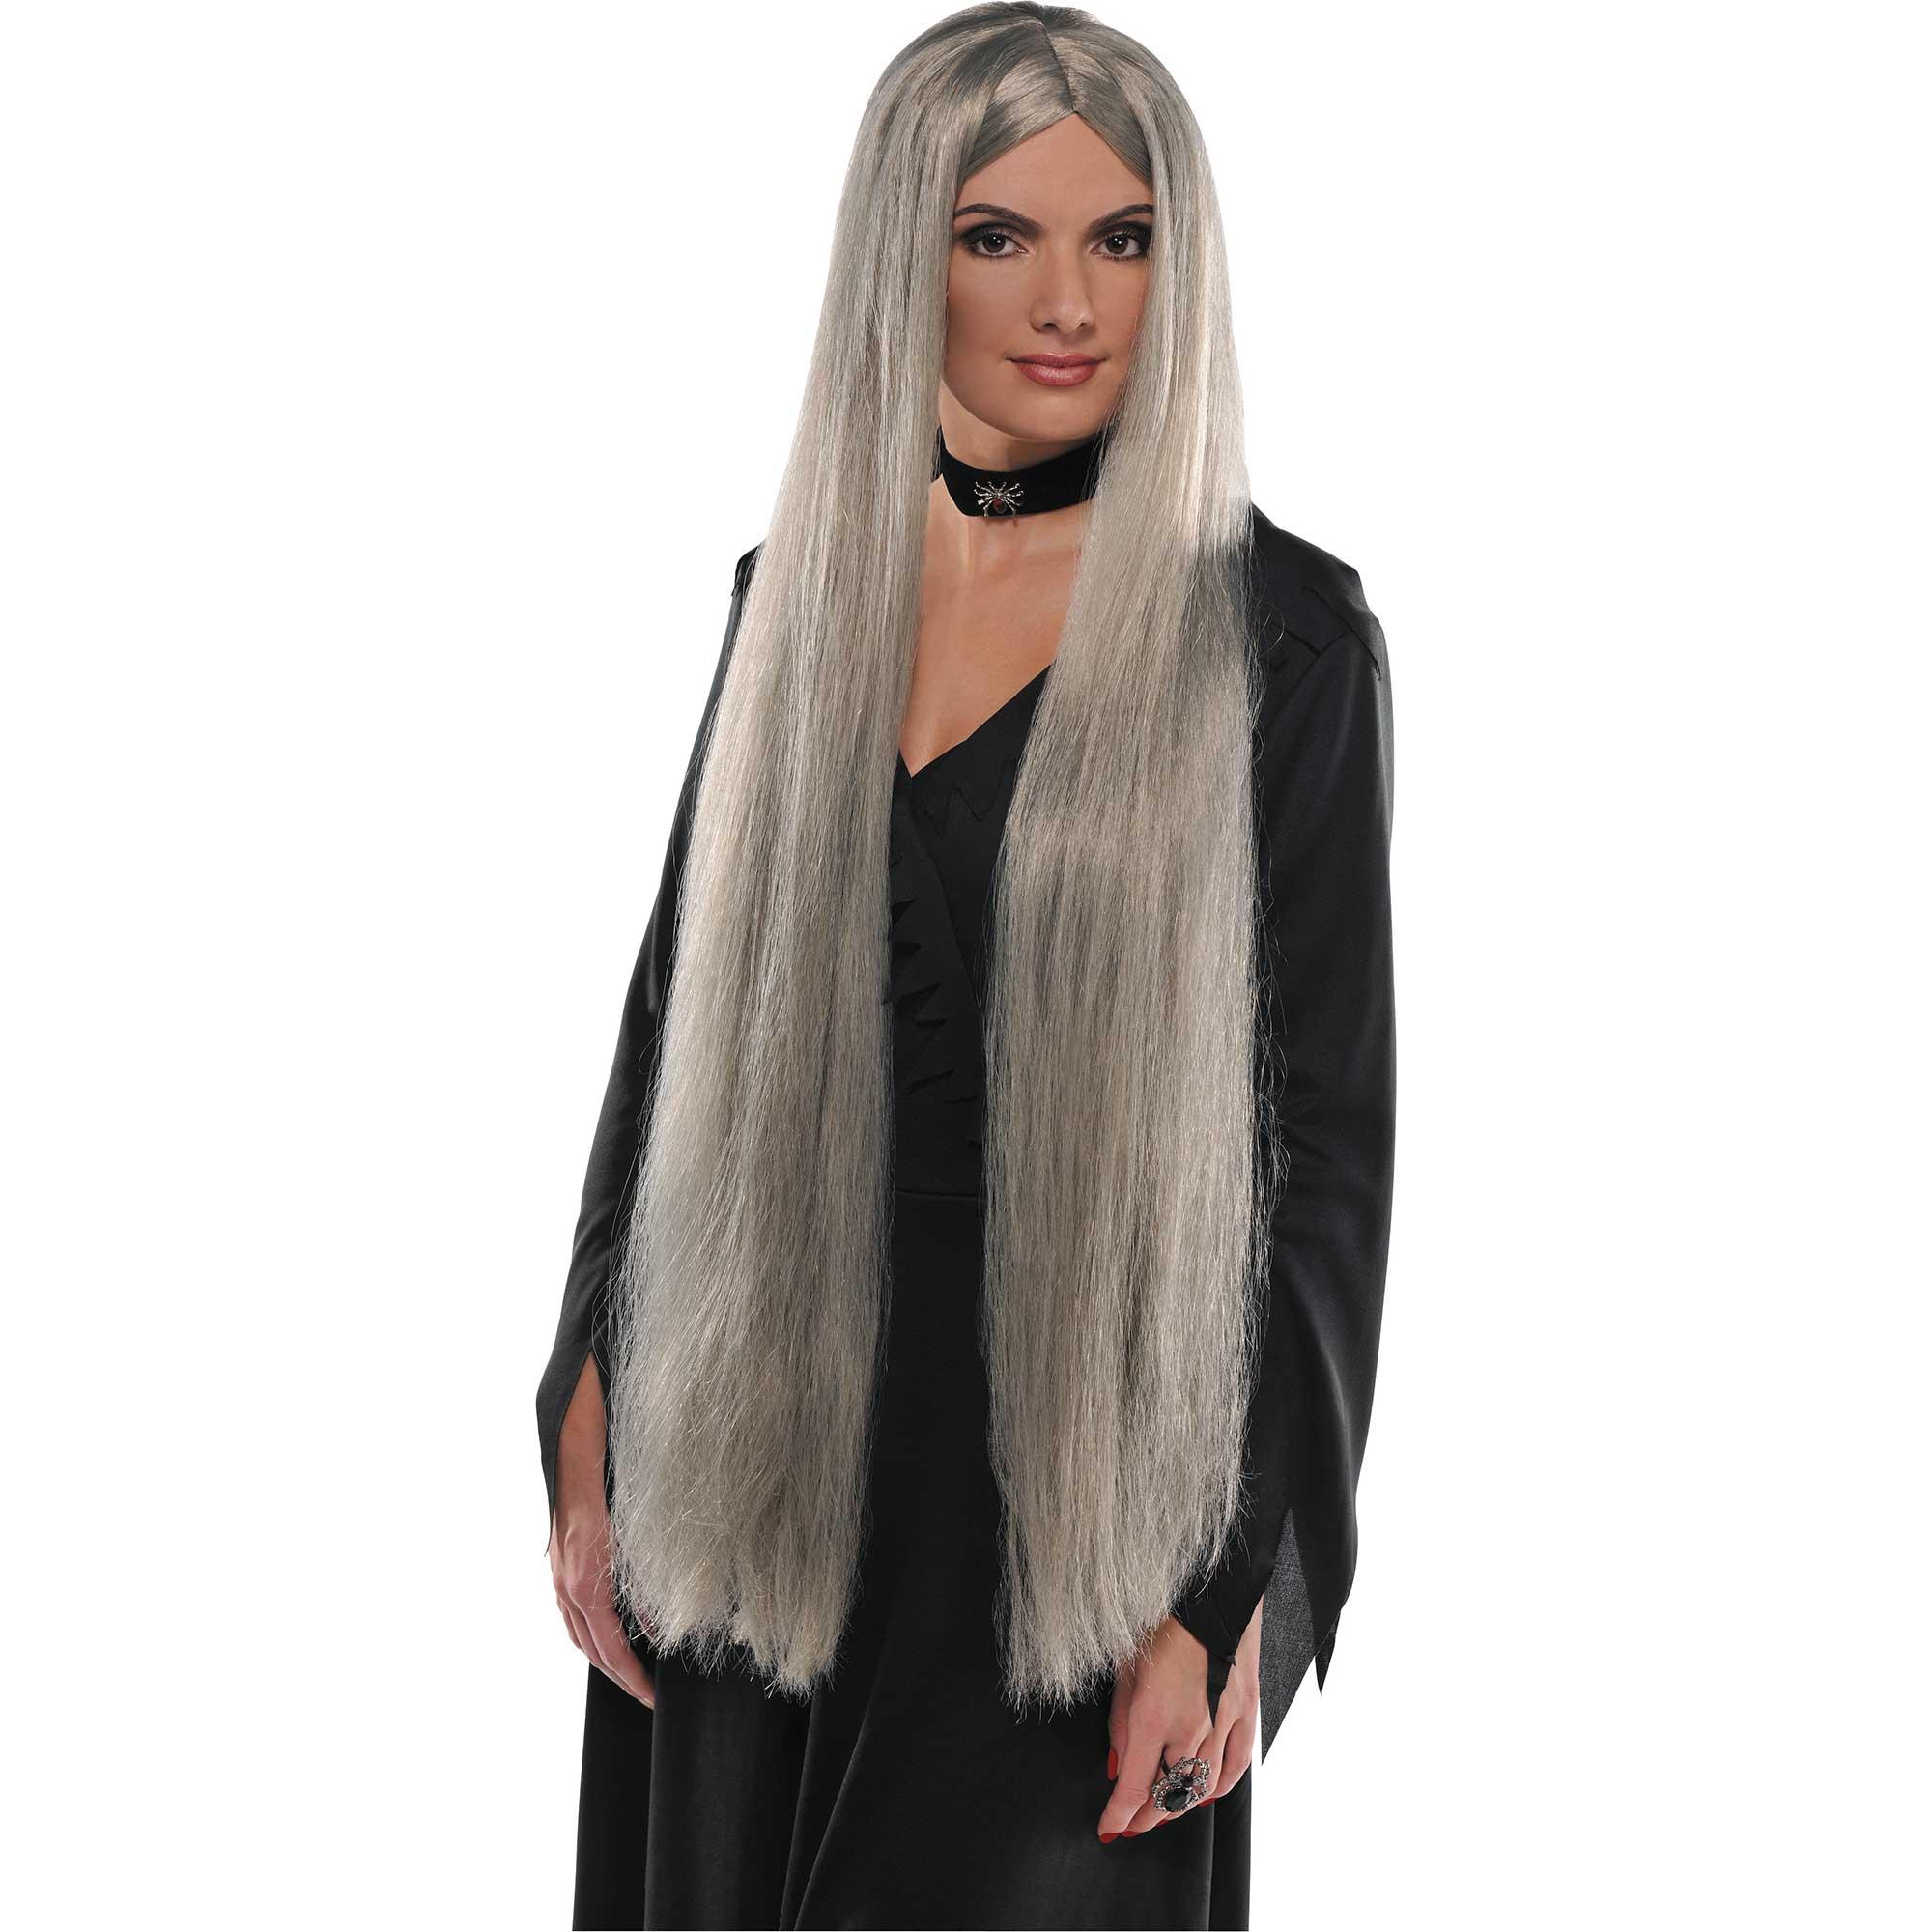 Wig Grey Extra Long